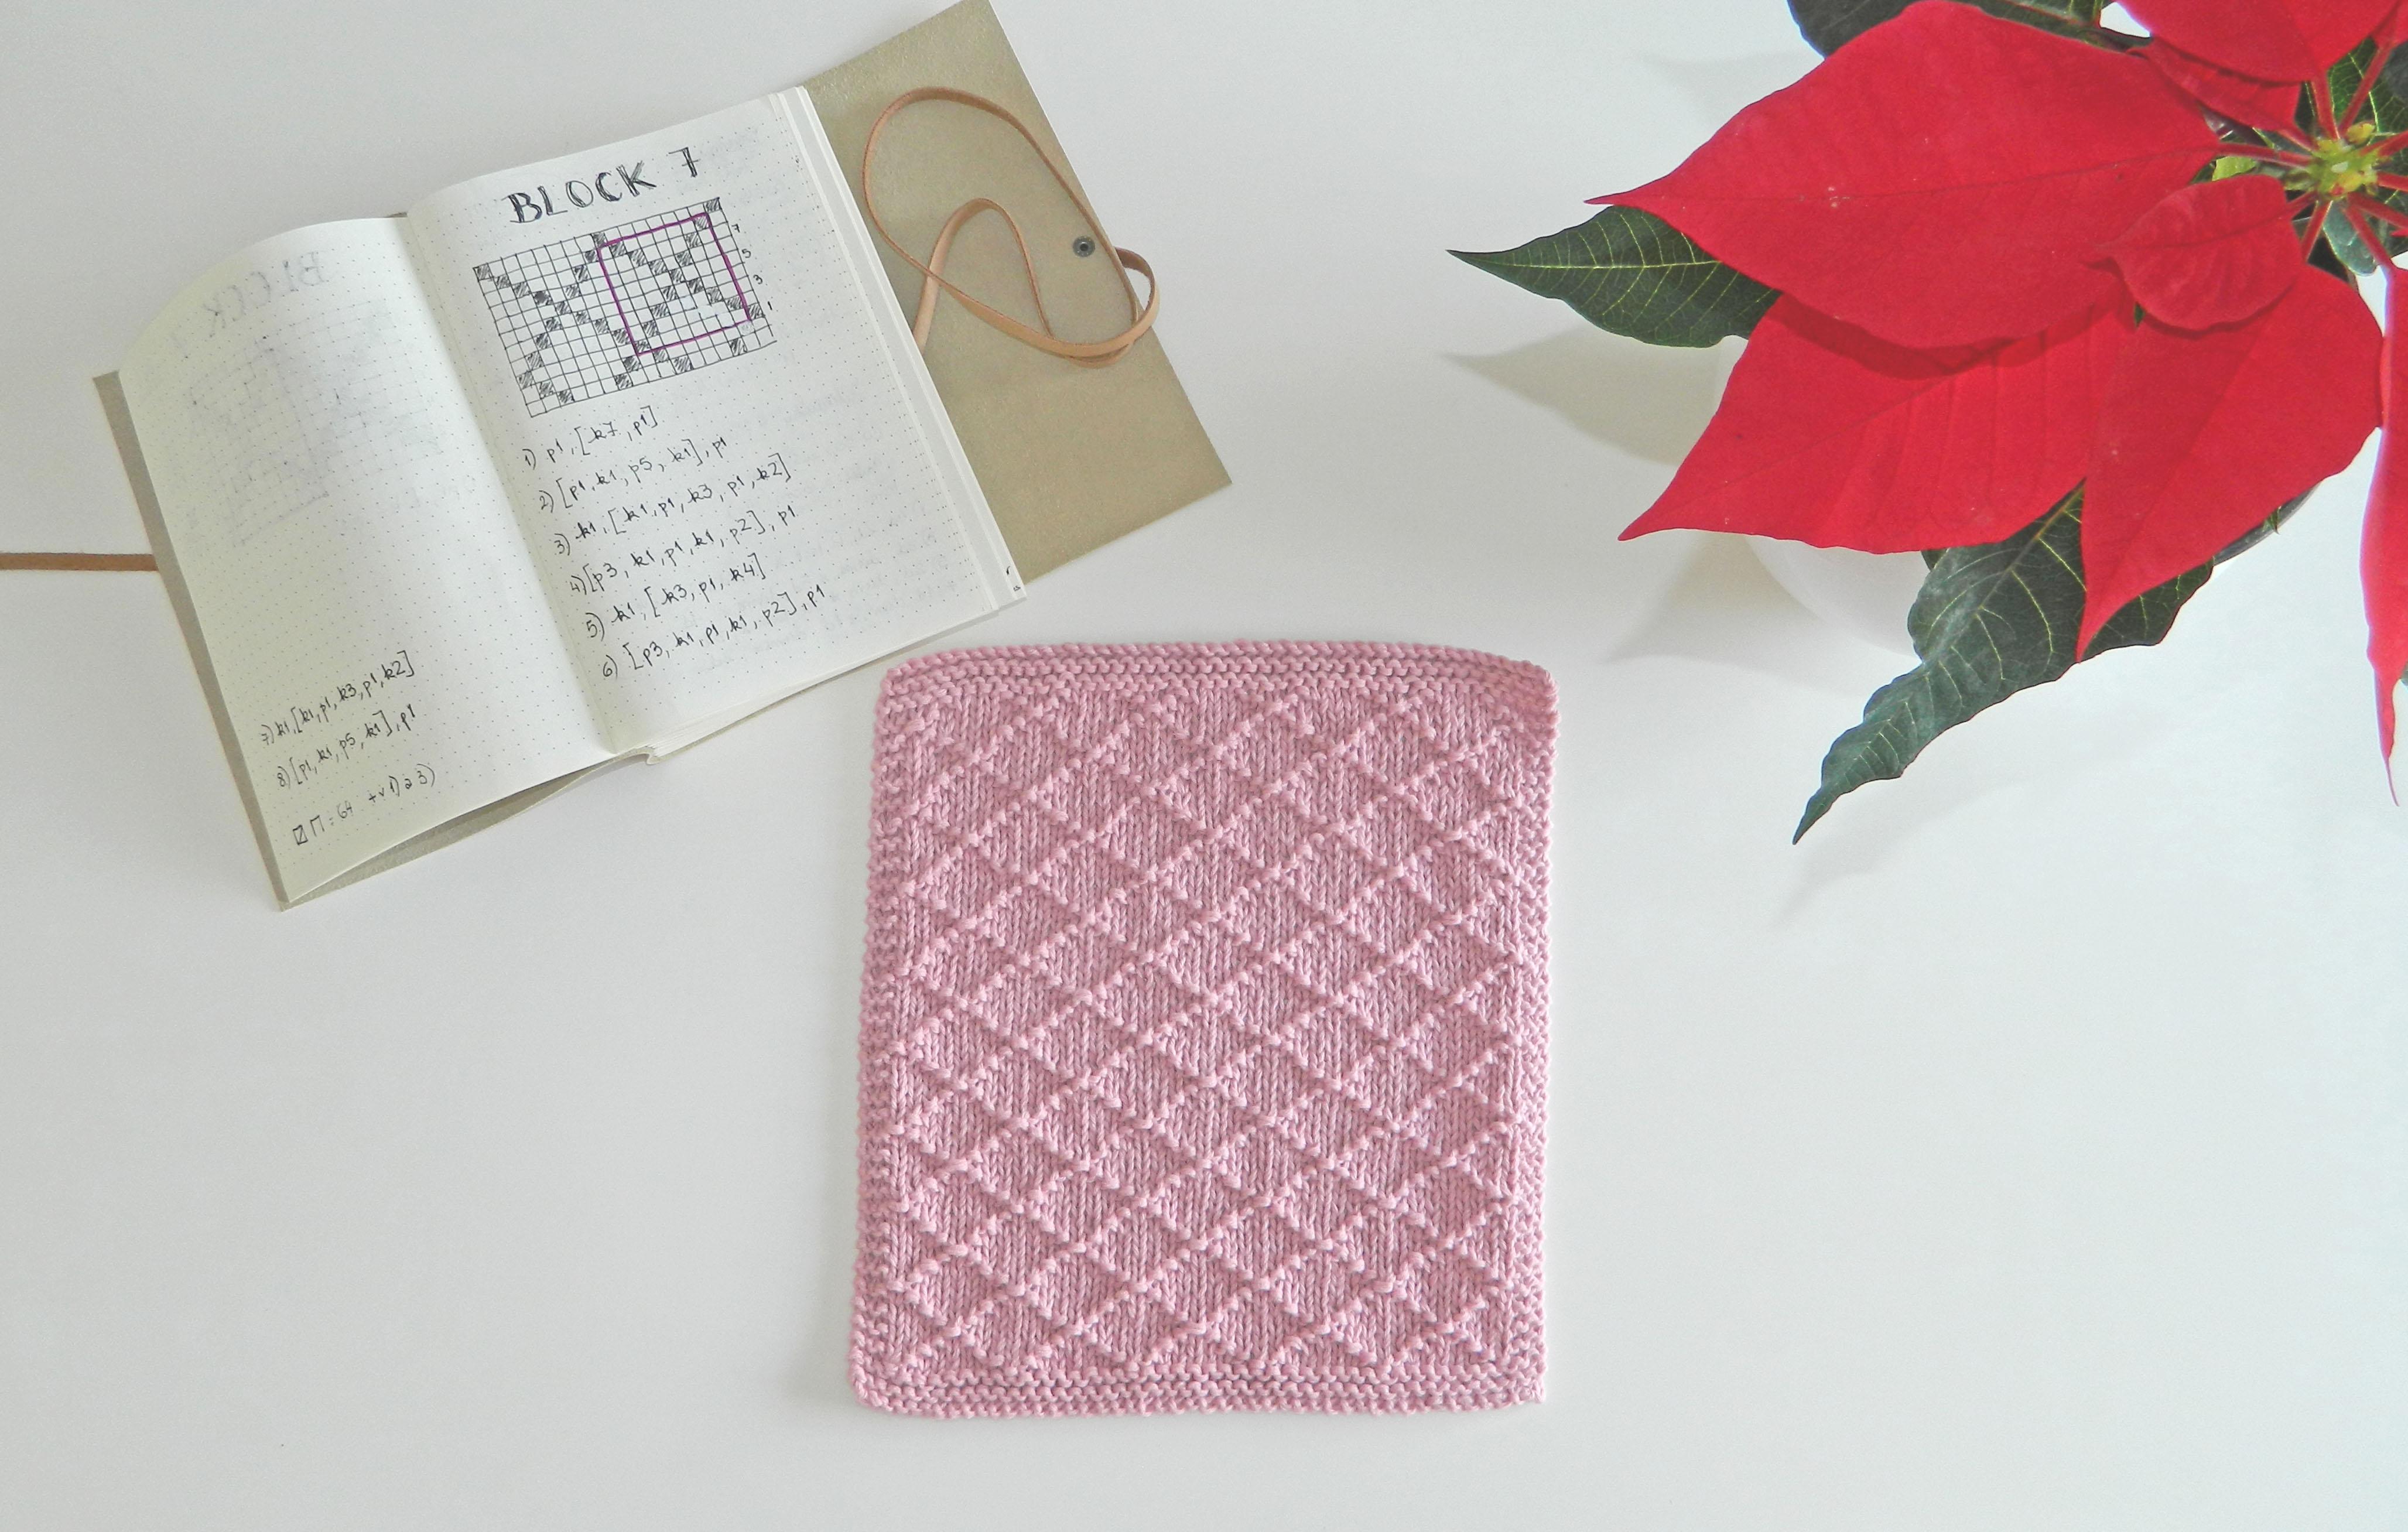 BLOCK 7 of 12 blocks of Xmas knitted blanket – OhLaLana!